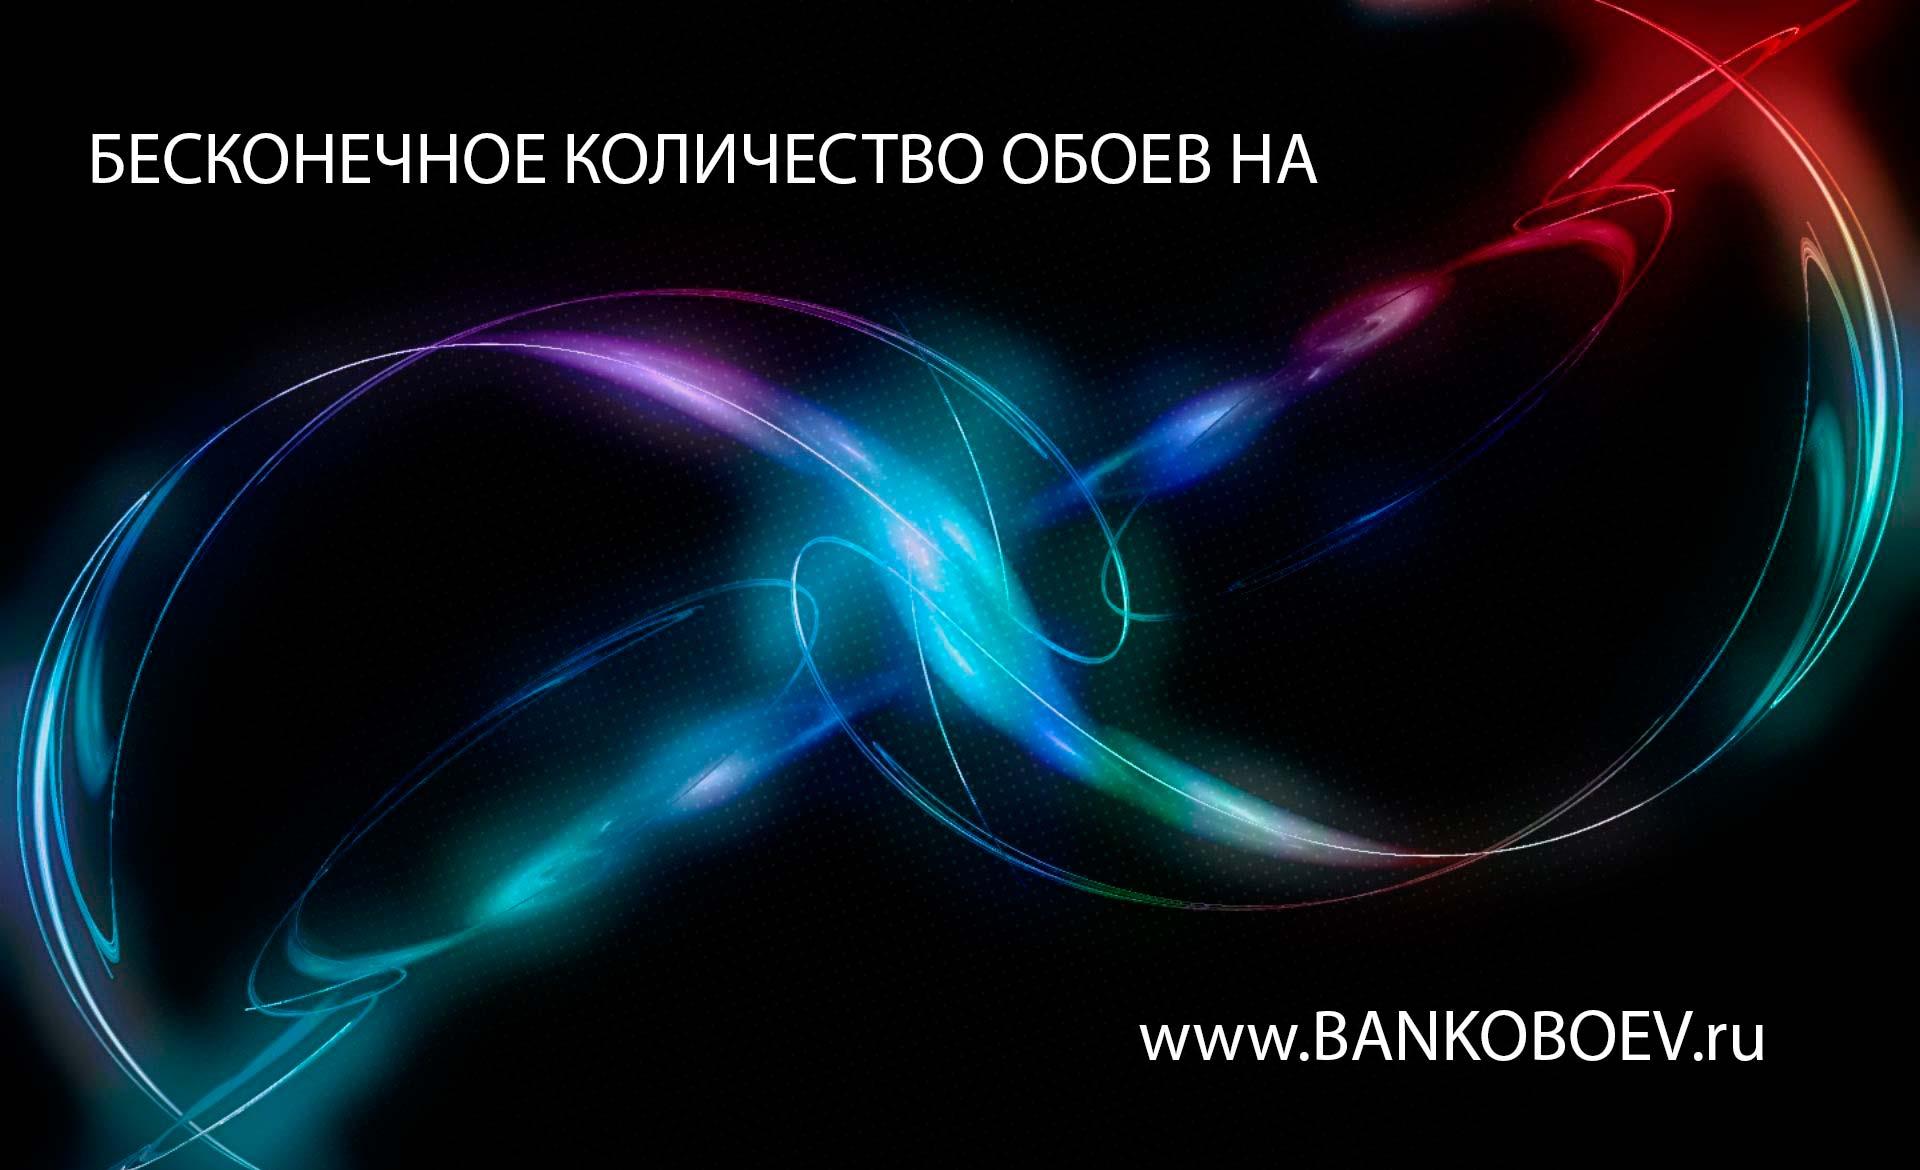 httpwwwbankoboevruimagesMjU0Njg4BankoboevRu slipknot cooljpg 1920x1170